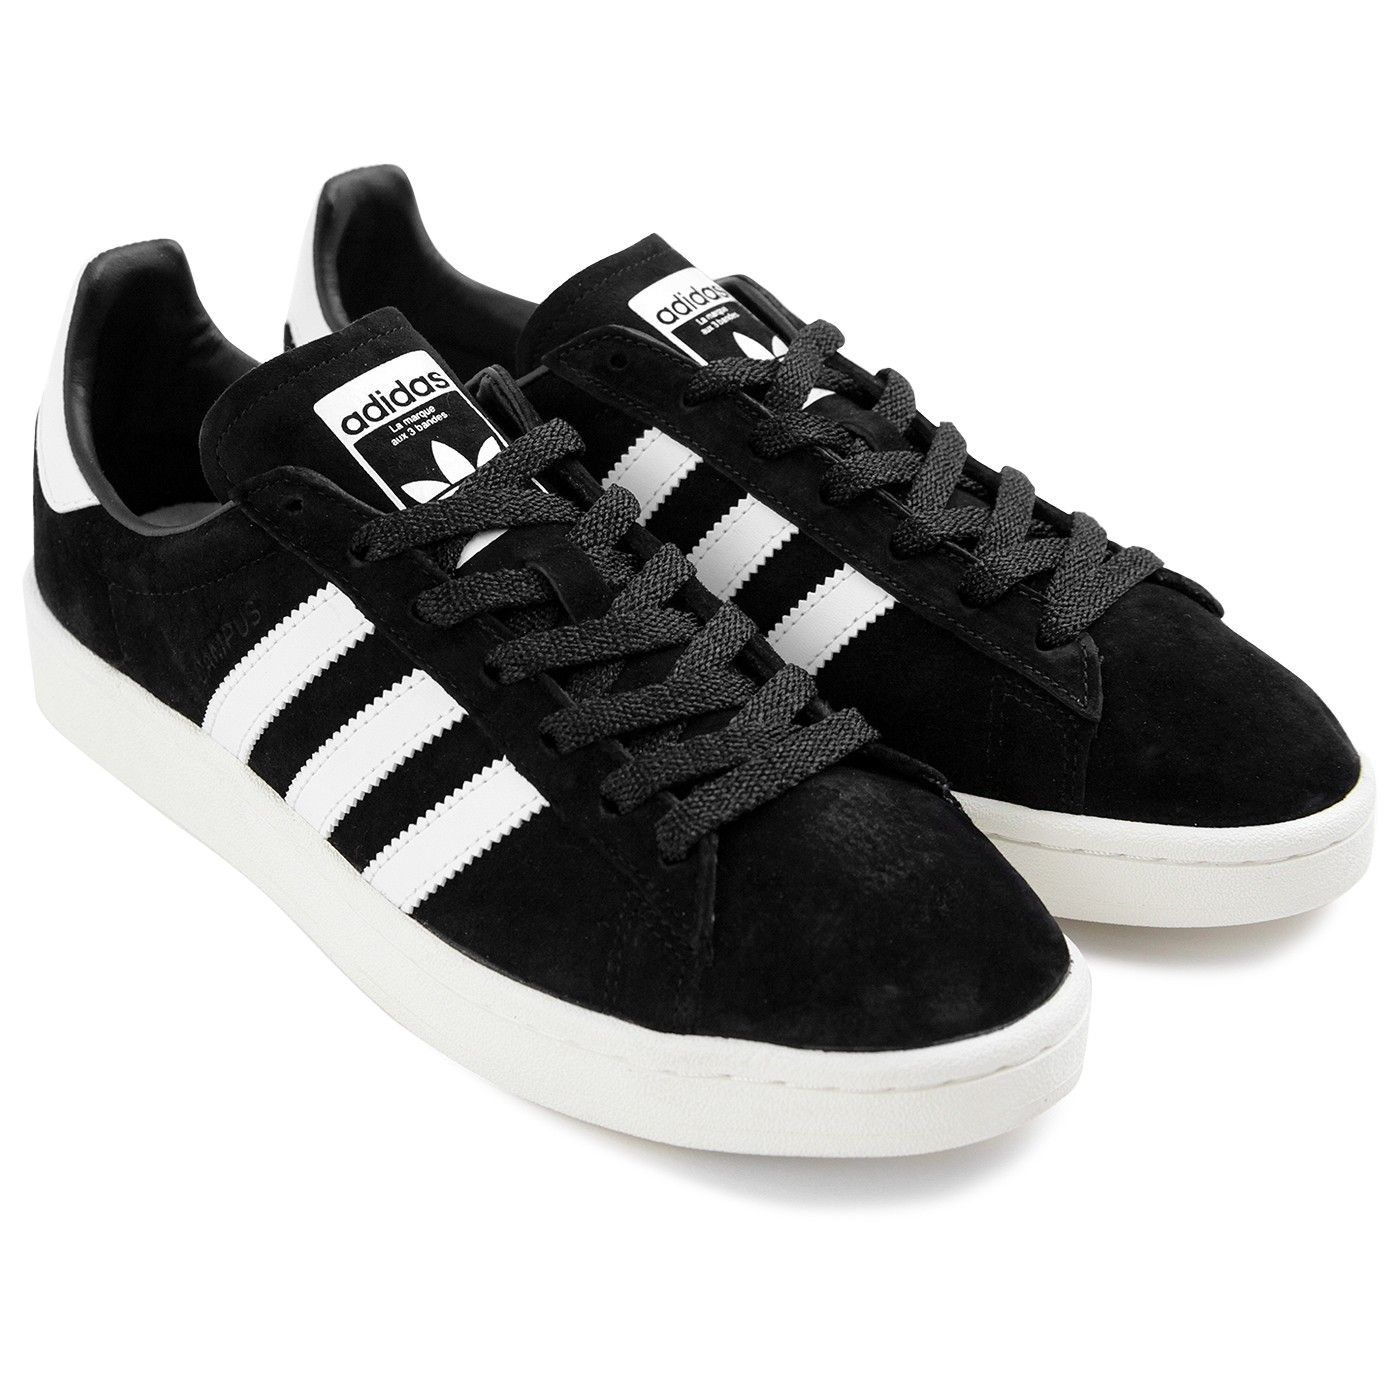 Enriquecer O en cualquier sitio  Campus Shoes in Core Black / Footwear White / Chalk White by Adidas  Originals | Adidas, Adidas originals, Shoes